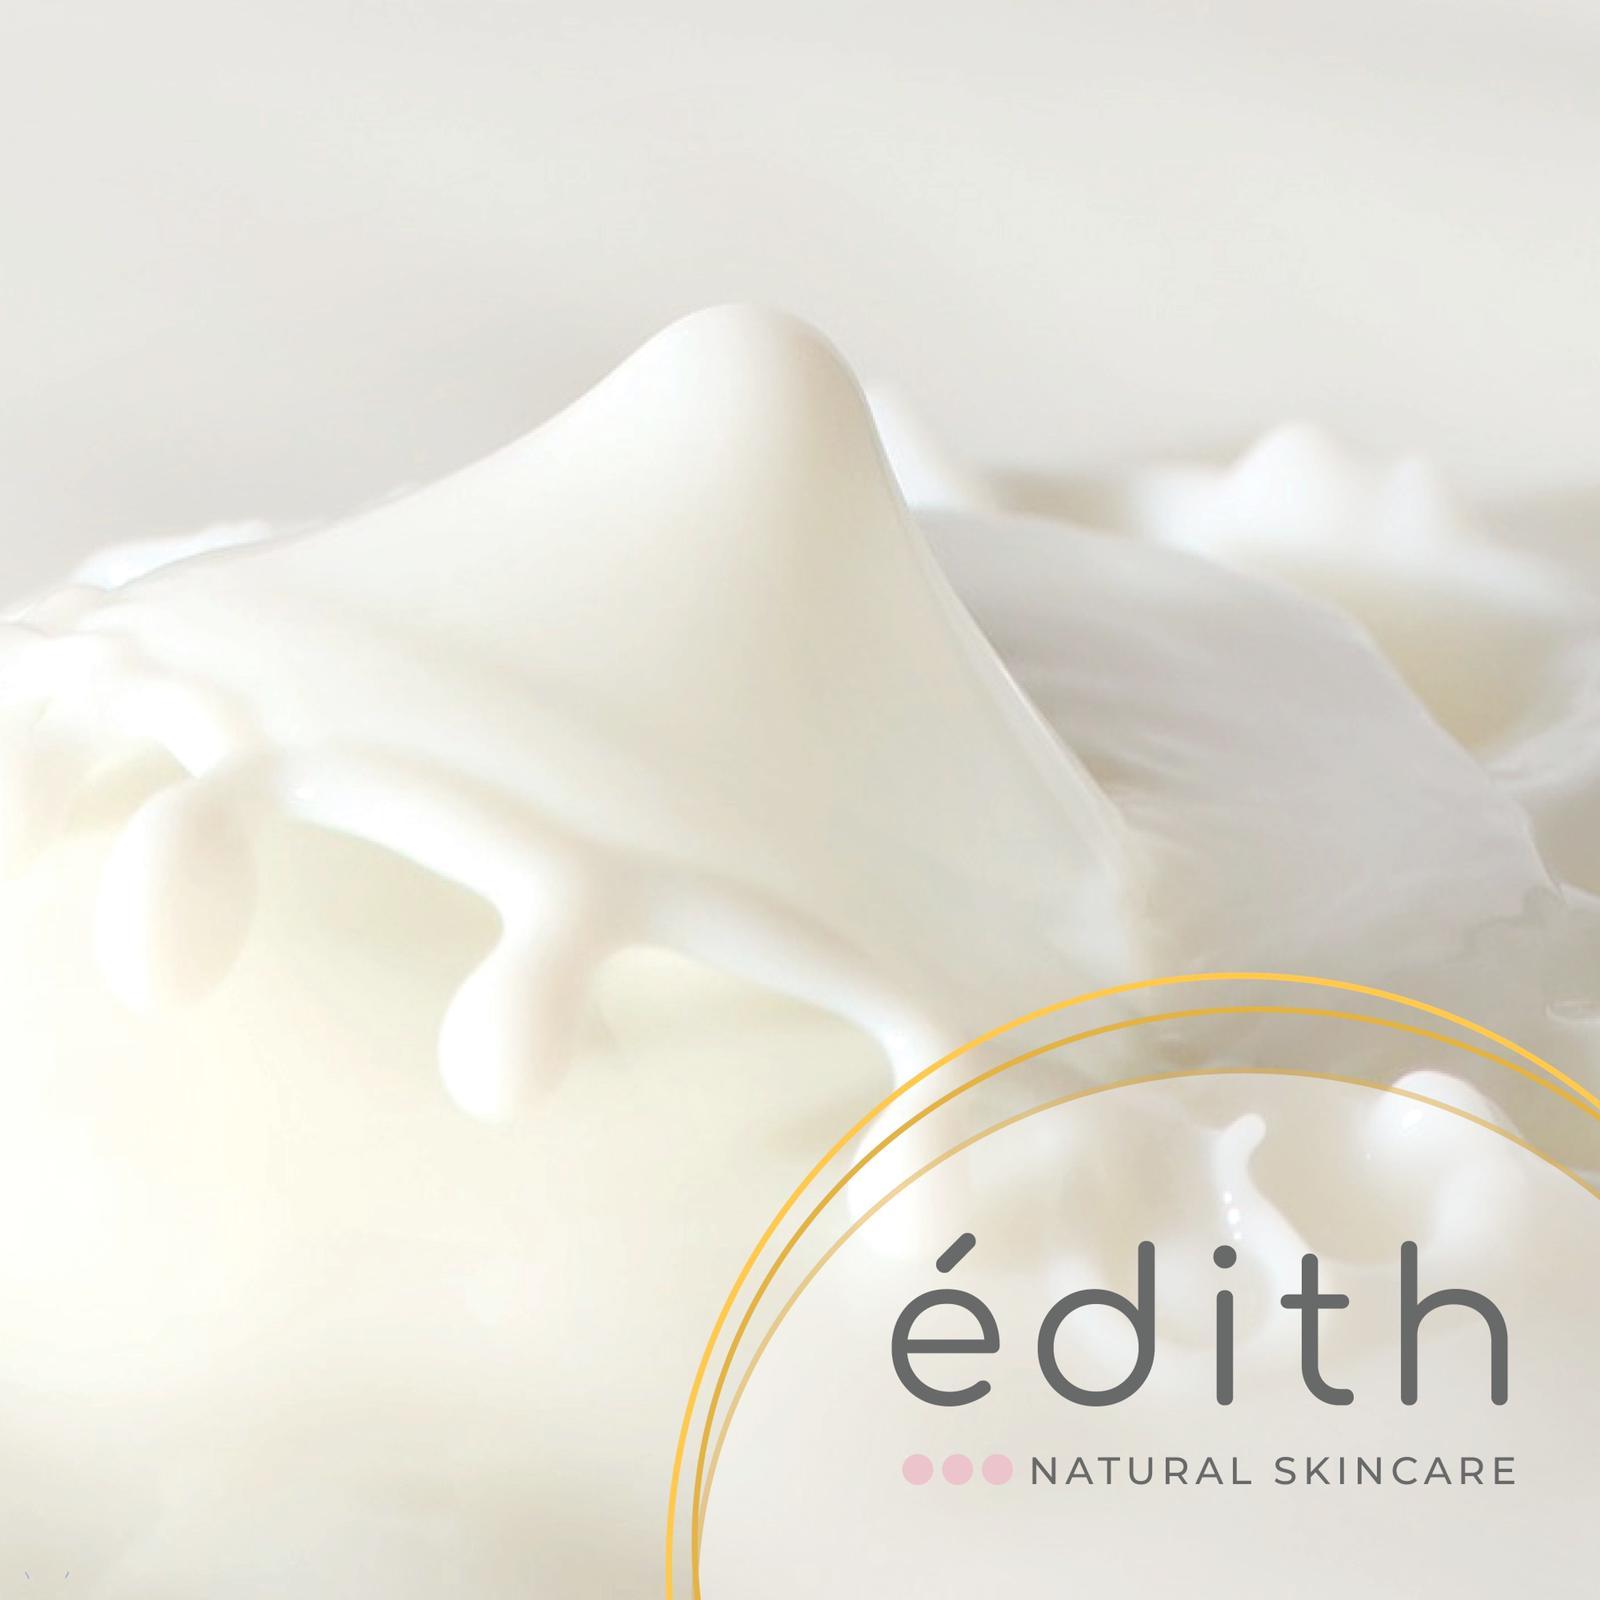 latte_asina_edith_cosmesi_zafferano_cosmetici_naturali